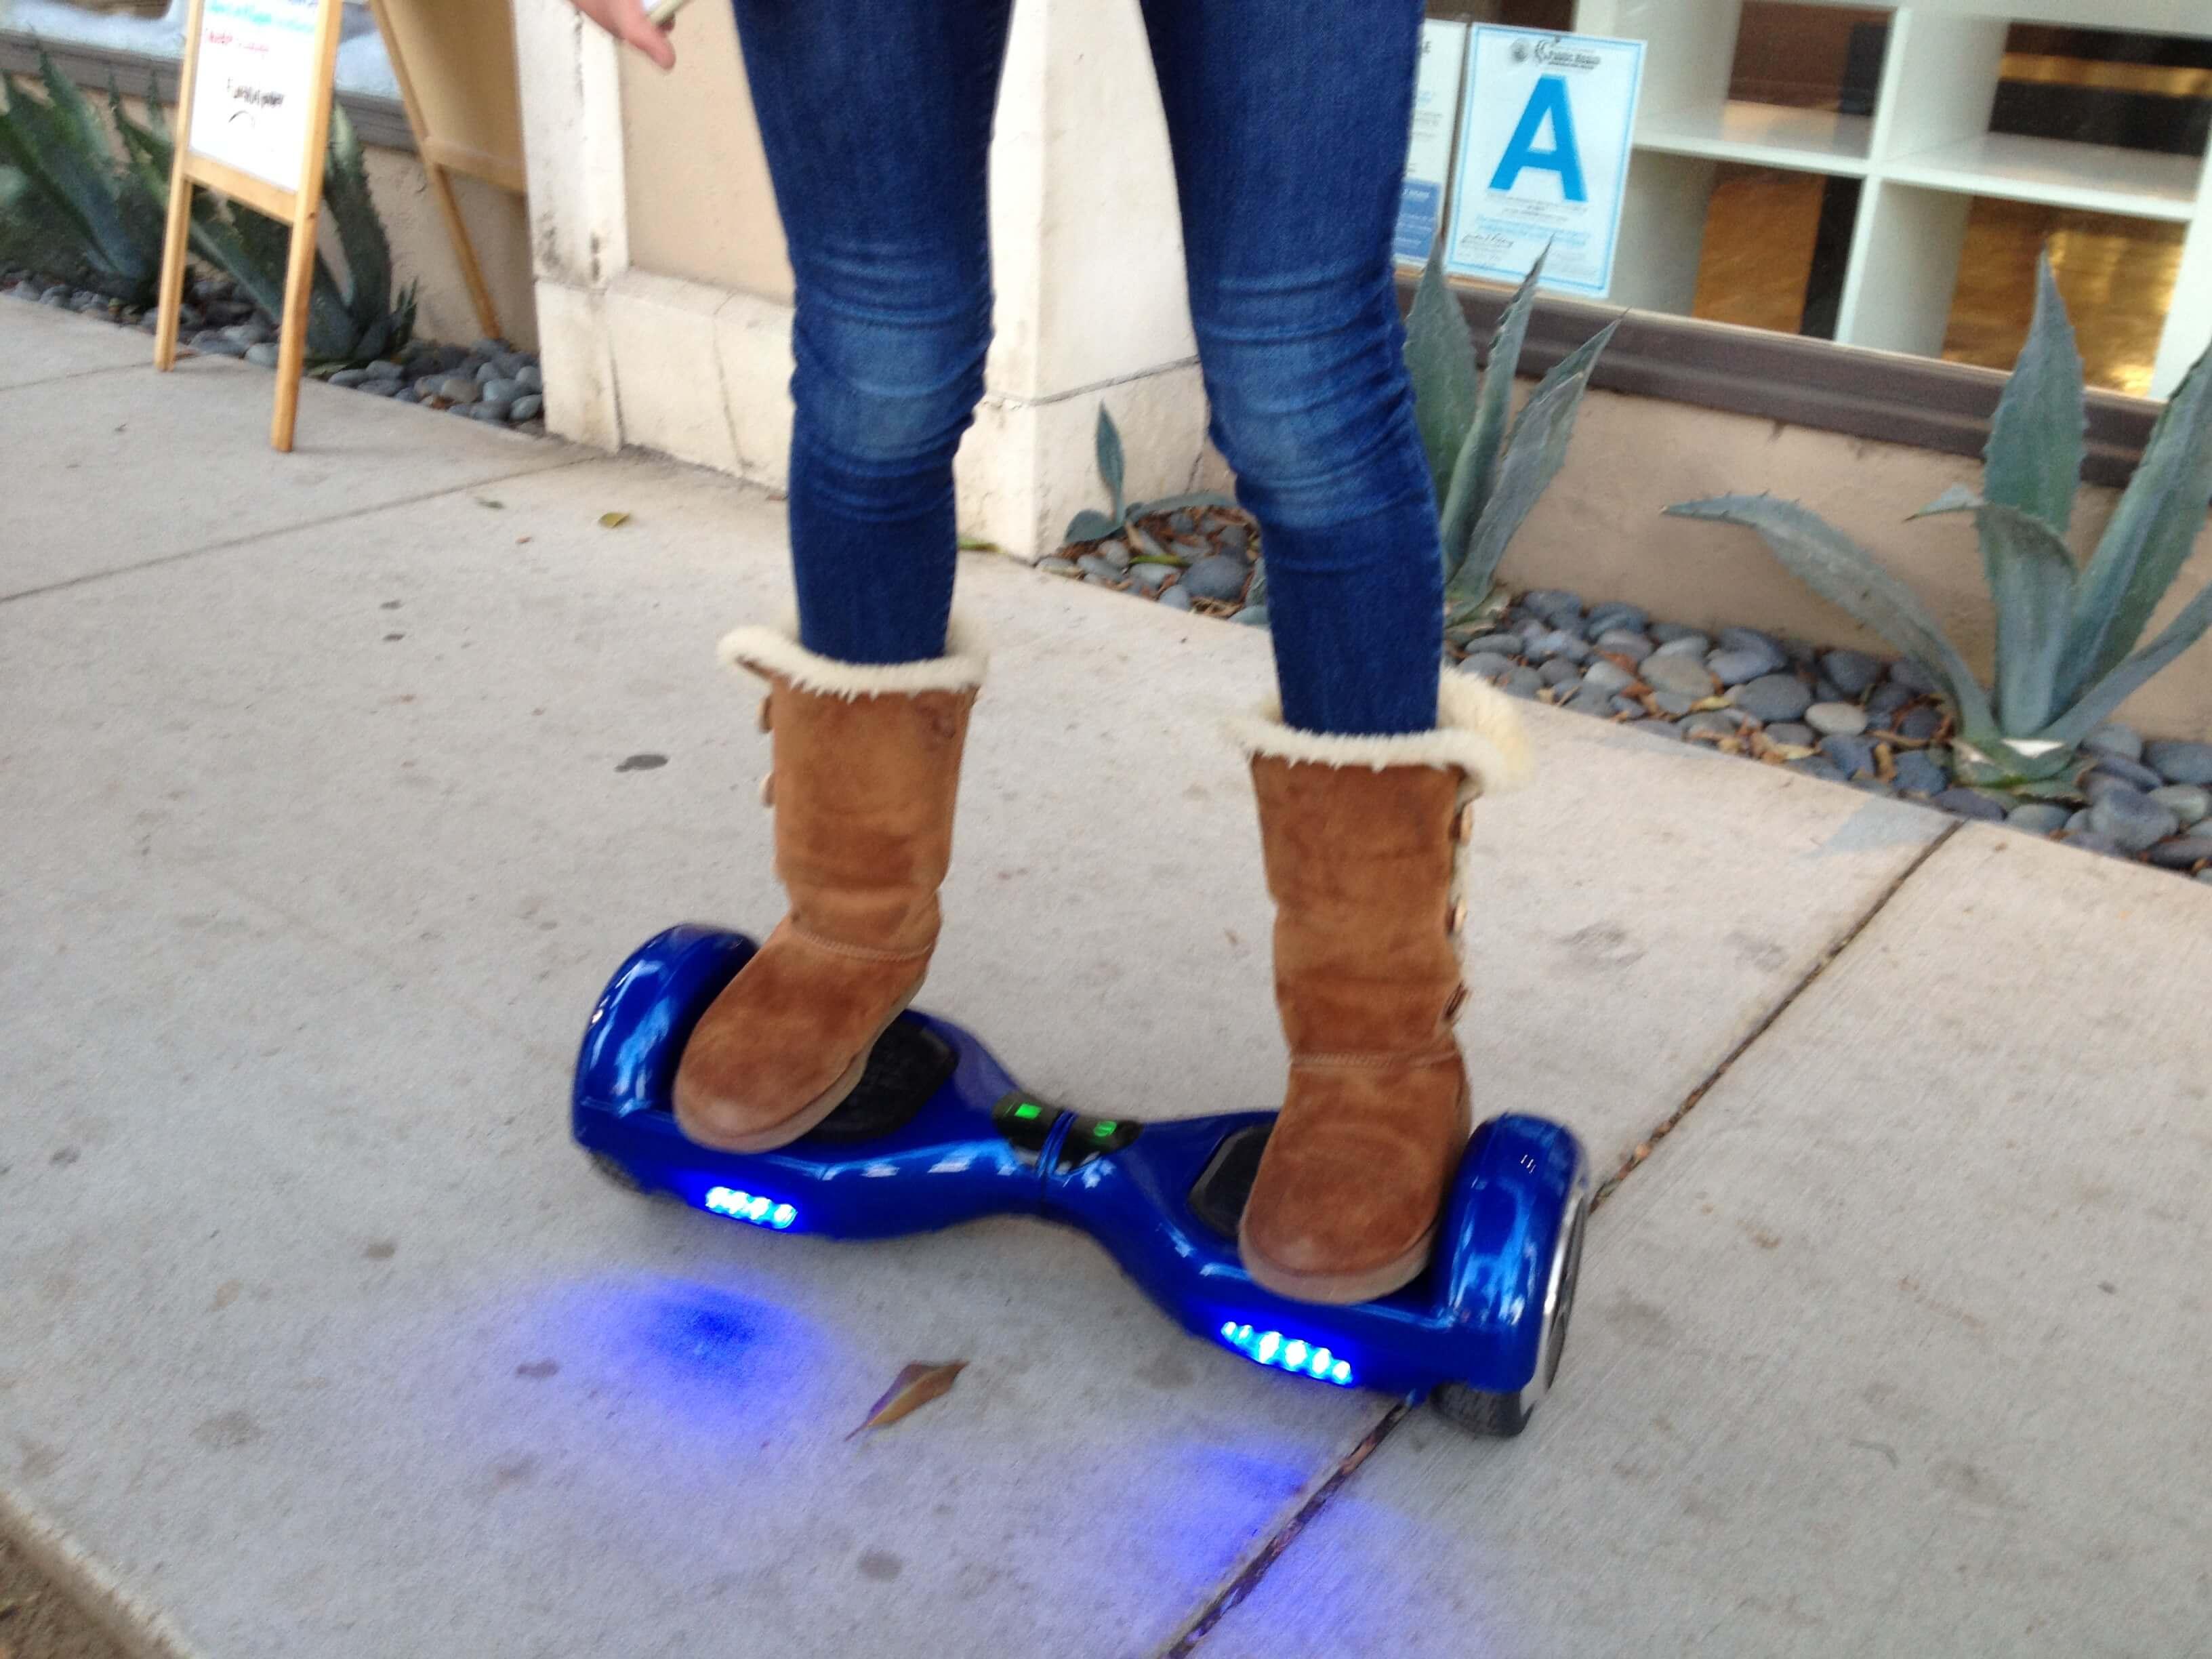 Hoverboard Safety for Kids